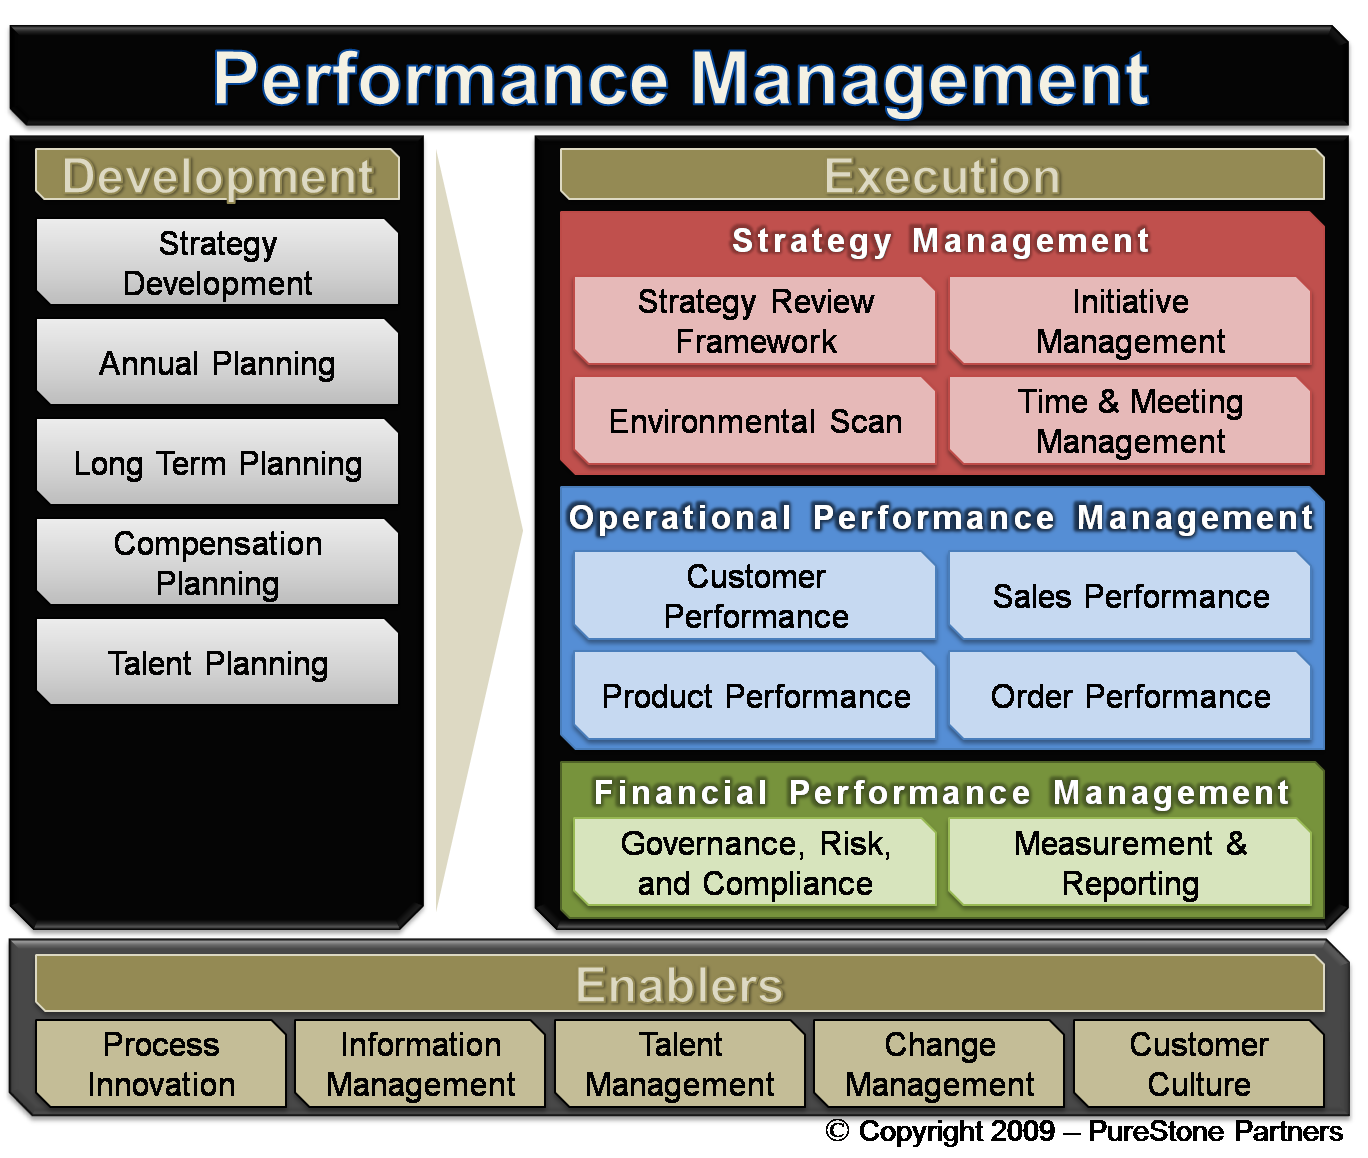 Strategic management systems